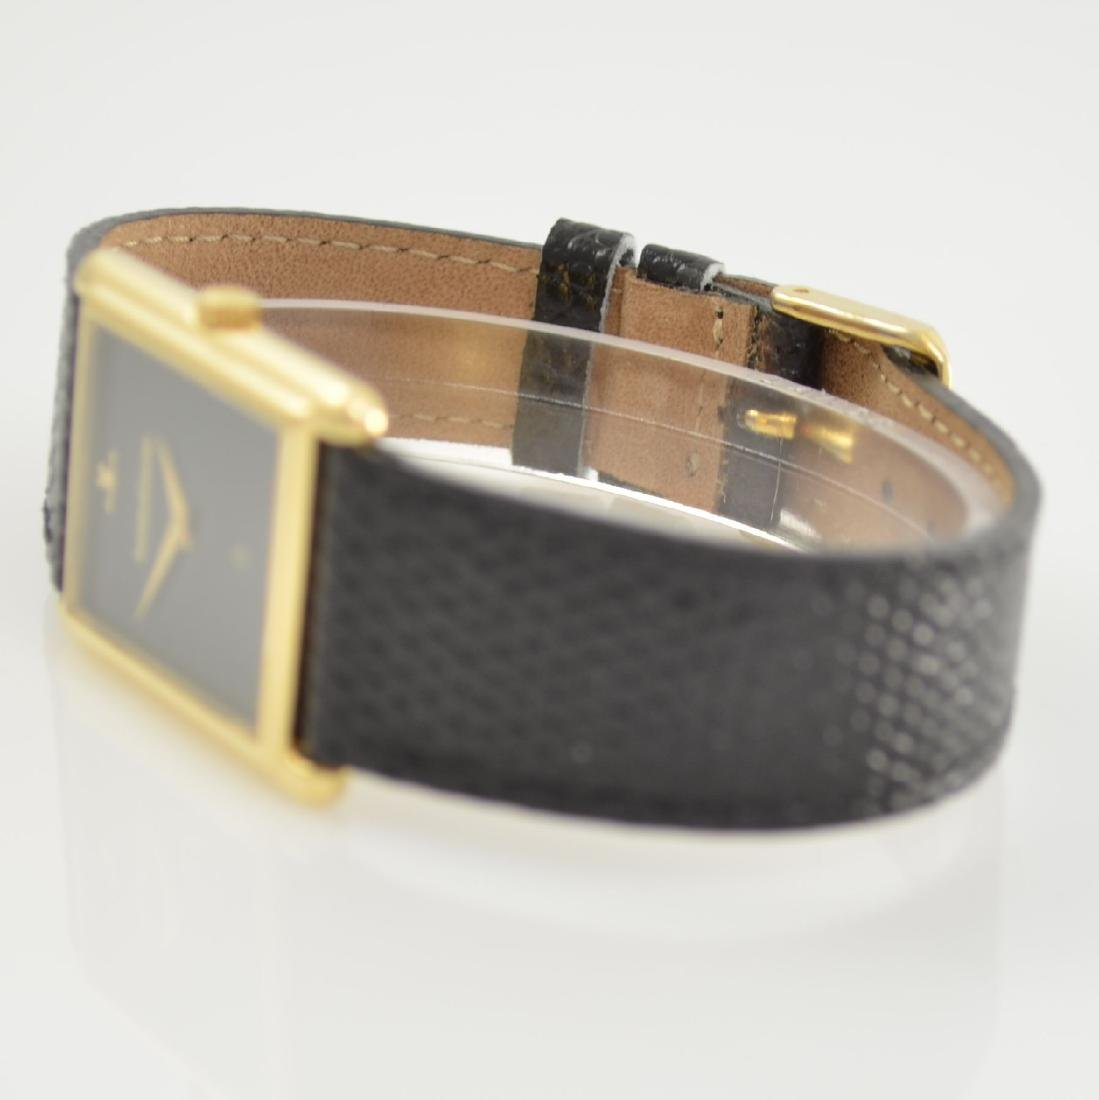 Jaeger-LeCoultre 18k yellow gold wristwatch - 4